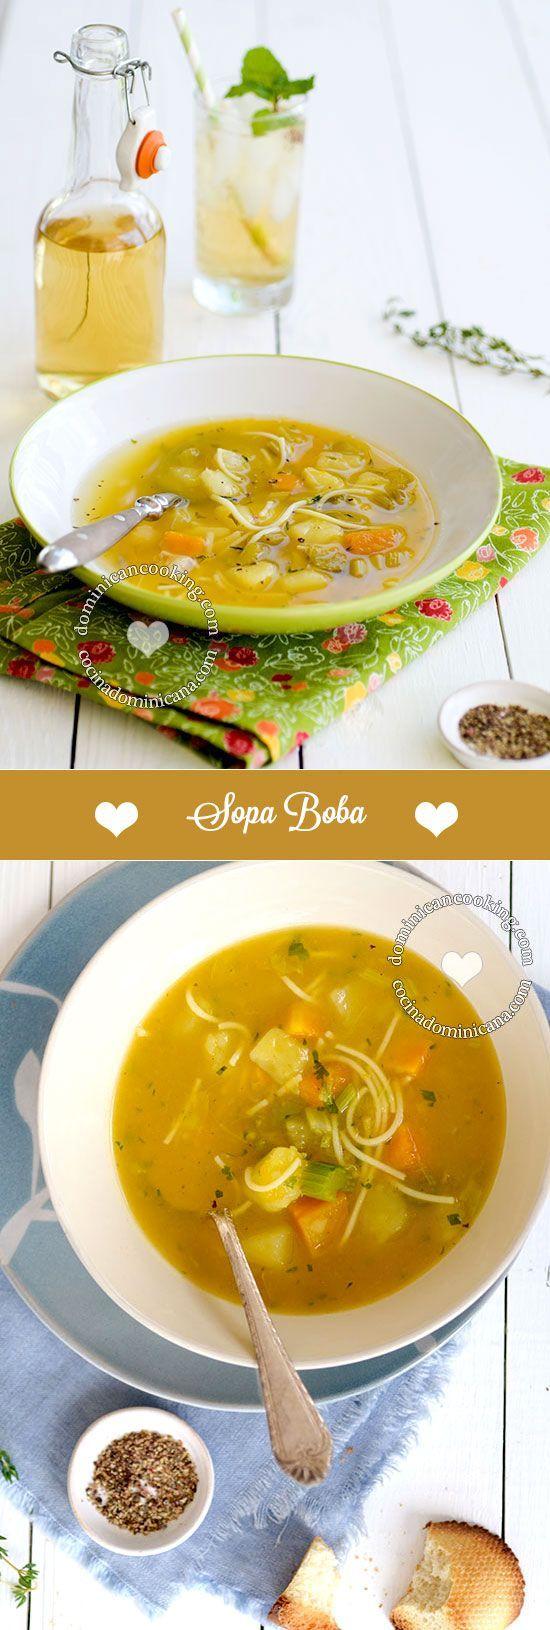 Receta de sopa de boba (sopa de verduras)   – Sopas